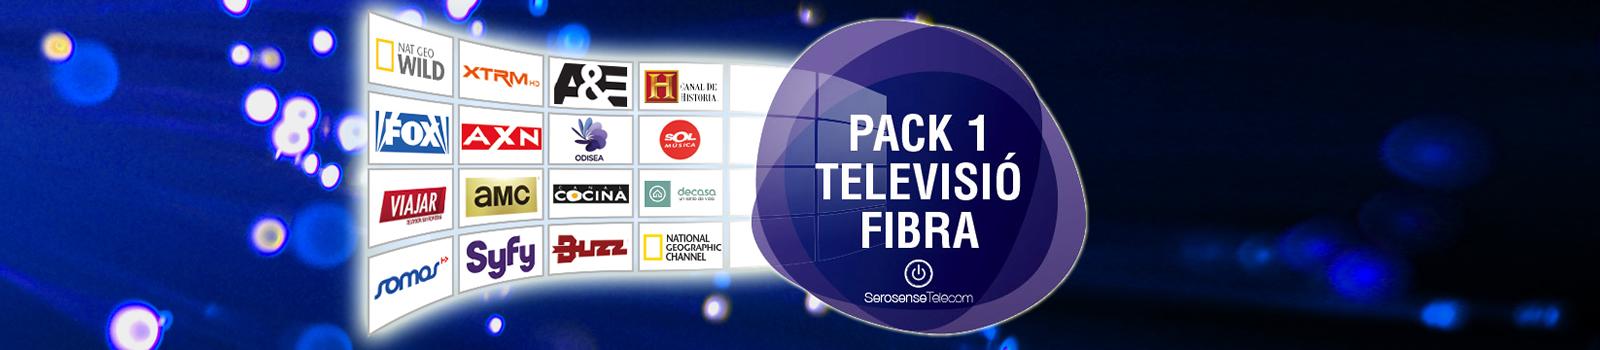 pack1-tv-fibra